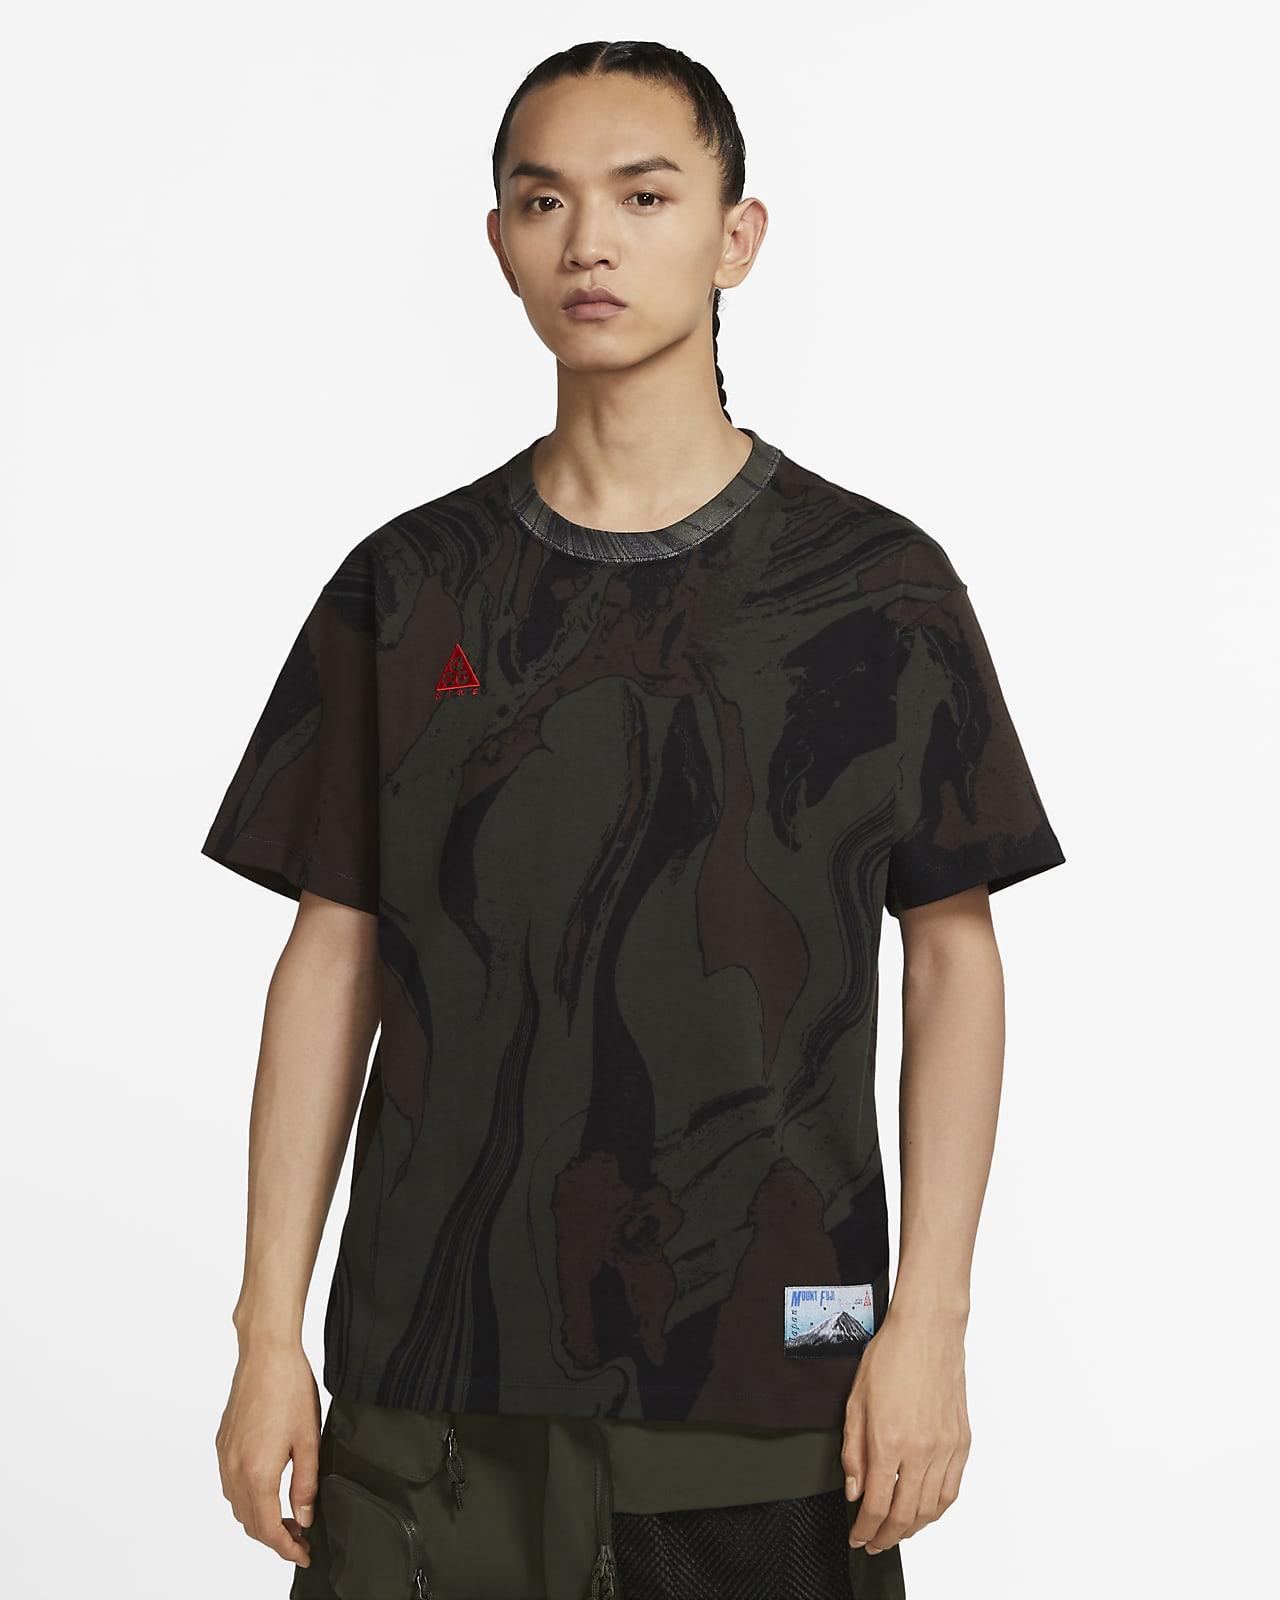 Nike ACG Mt. Fuji Men's Short-Sleeve T-Shirt